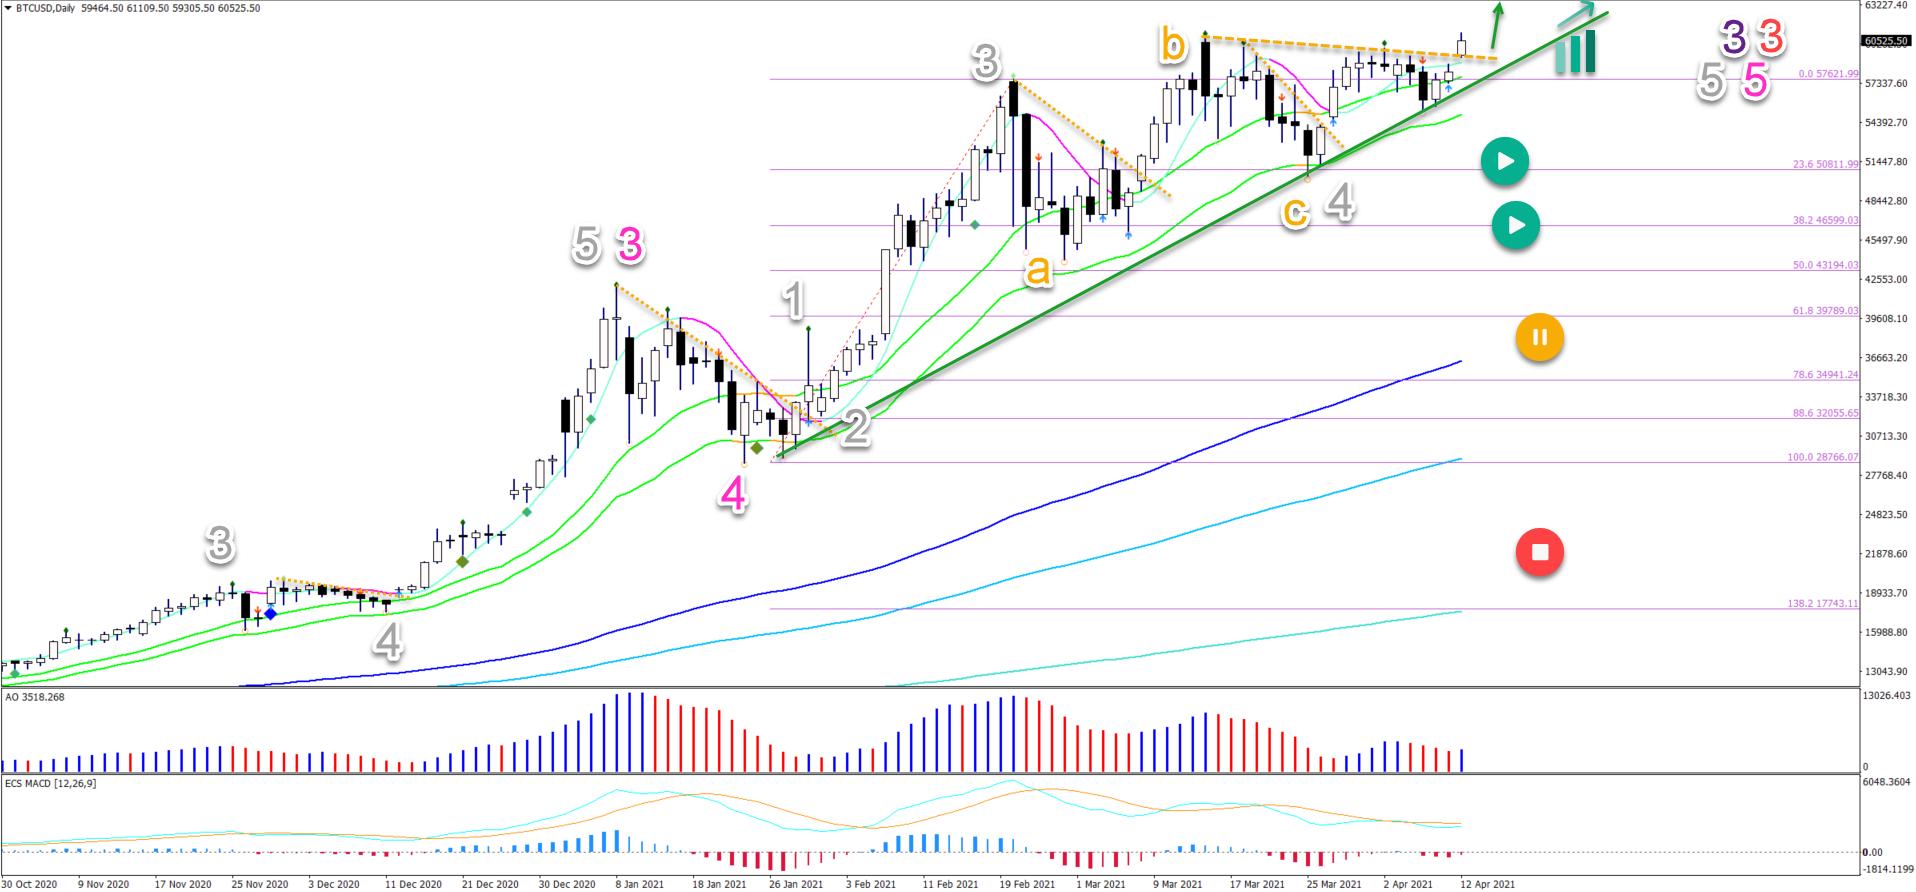 BTC/USD 12.04.2021 daily chart